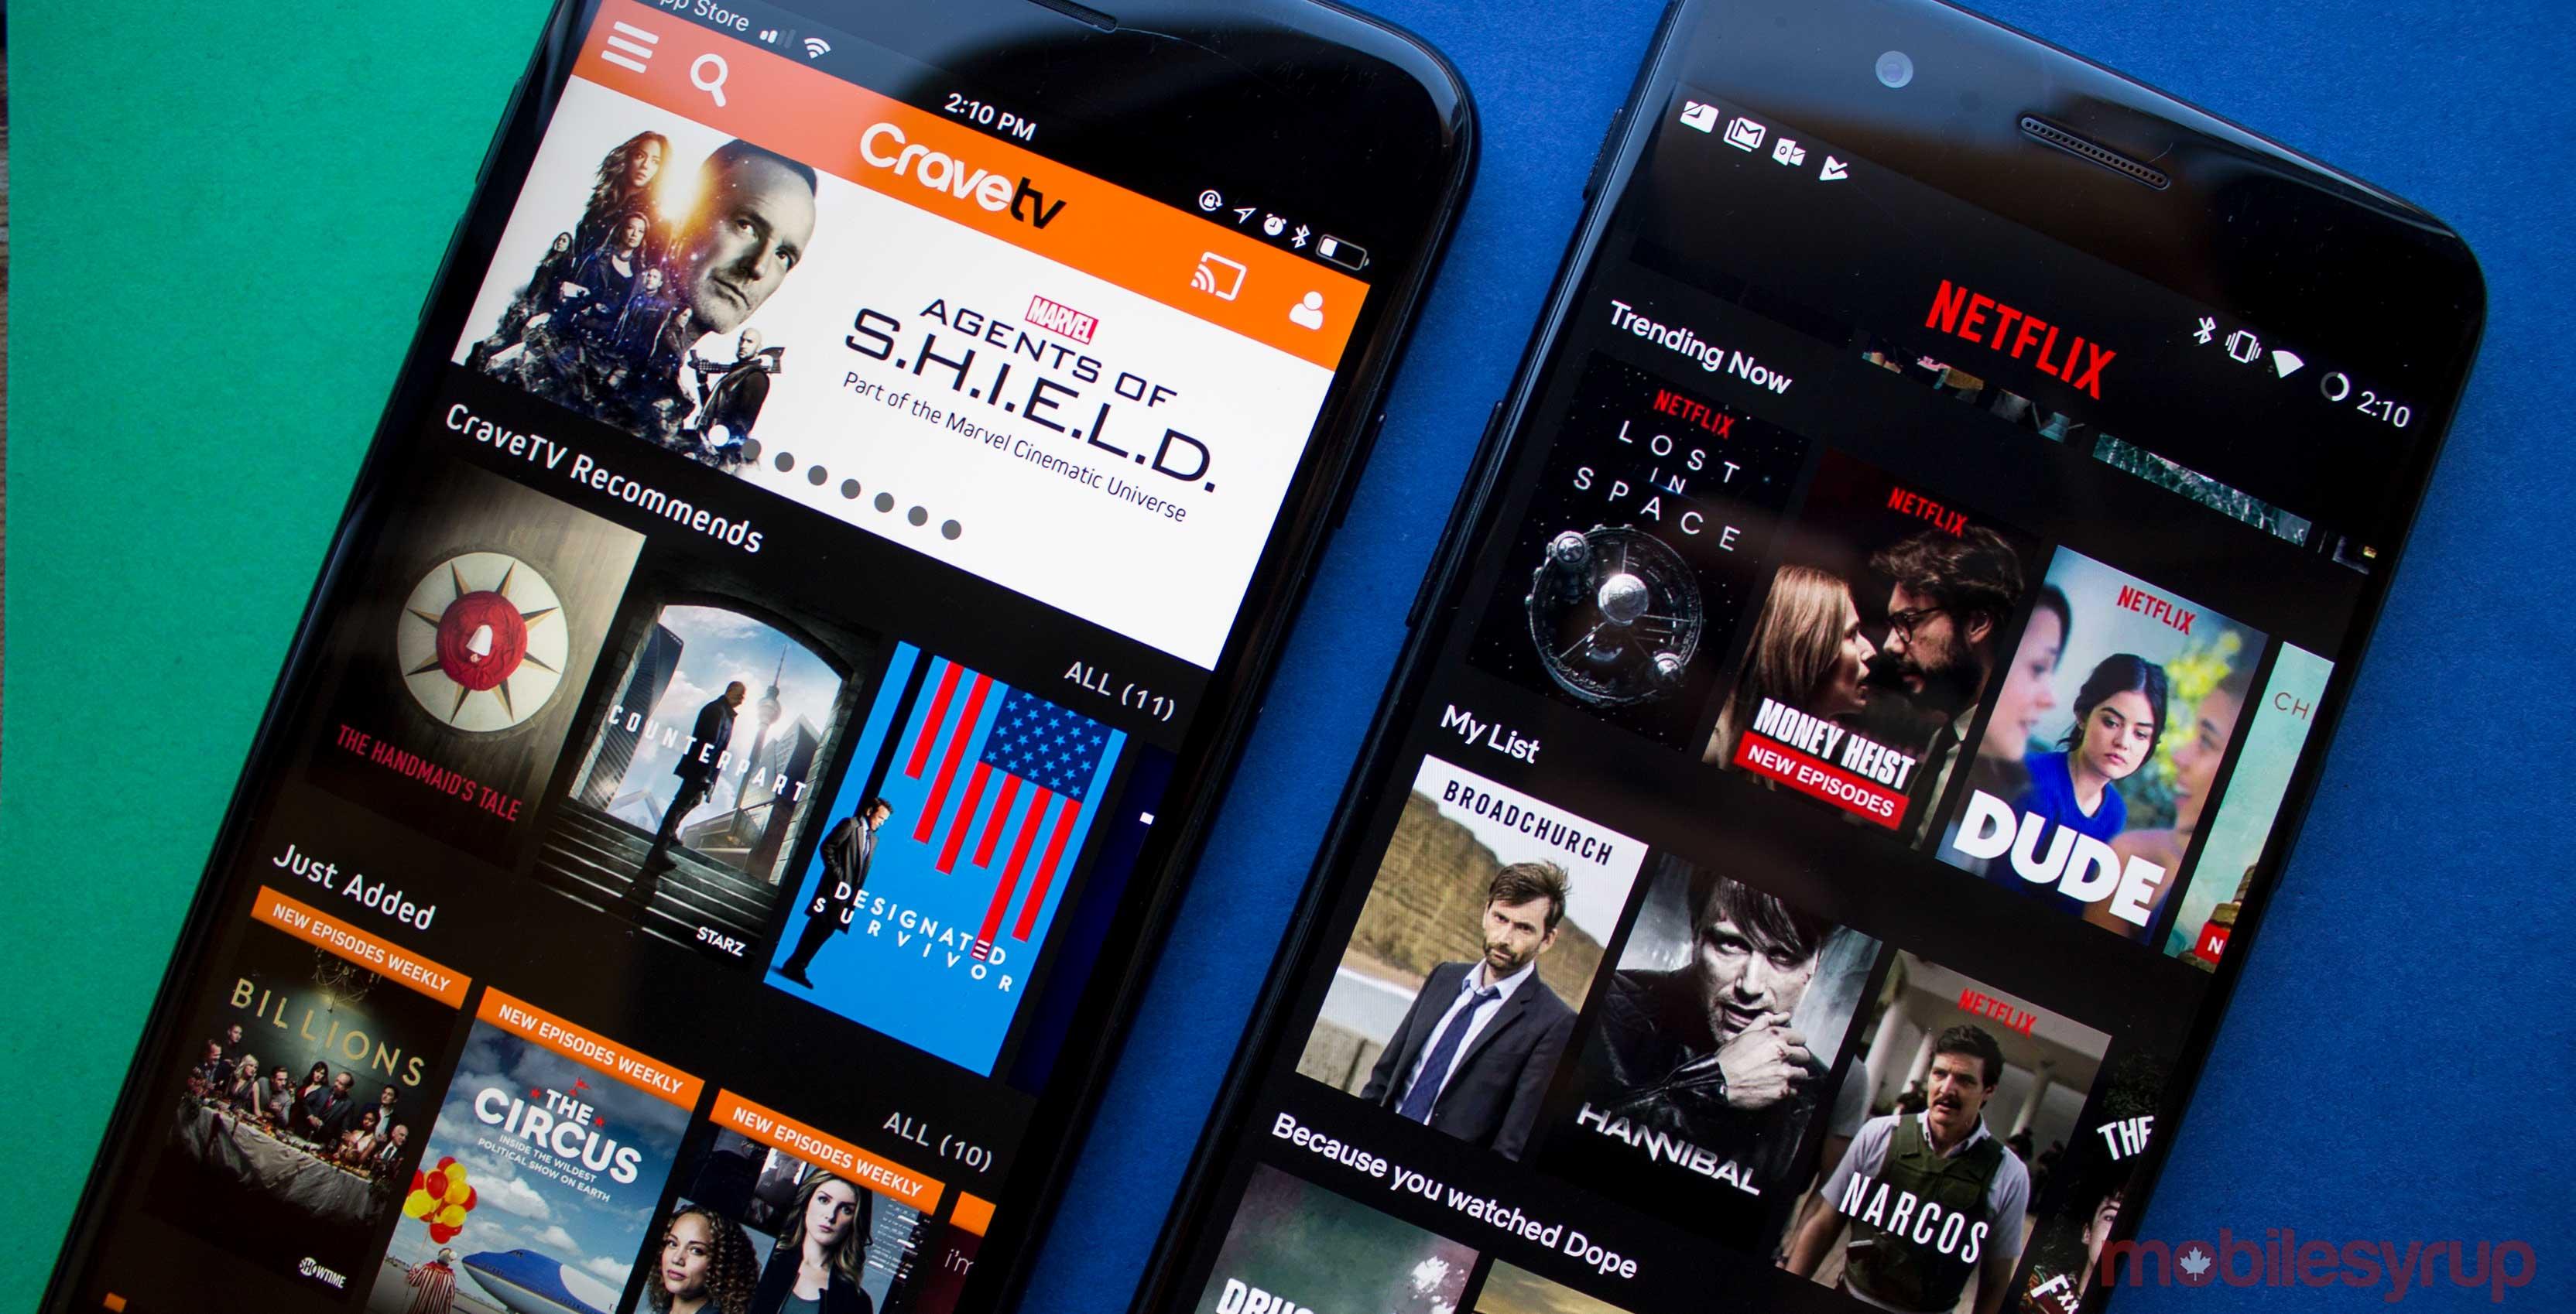 CraveTV and Netflix